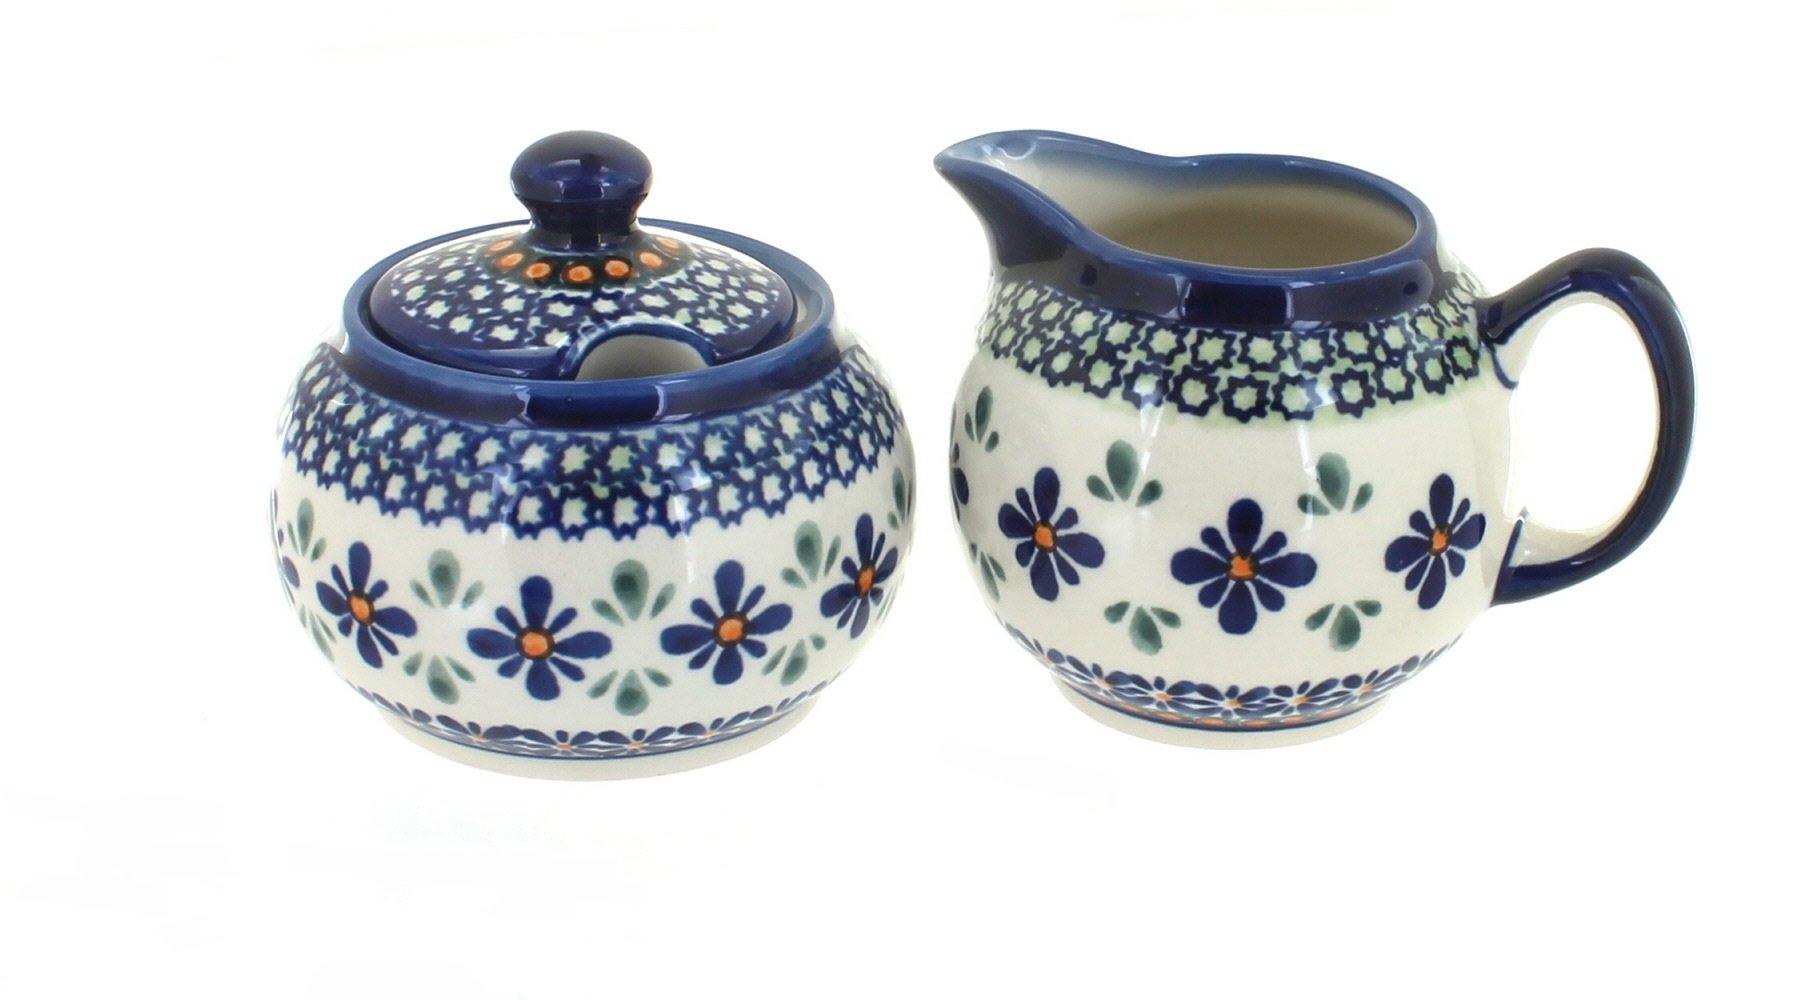 OKSLO Polish pottery mosaic flower cream and sugar set